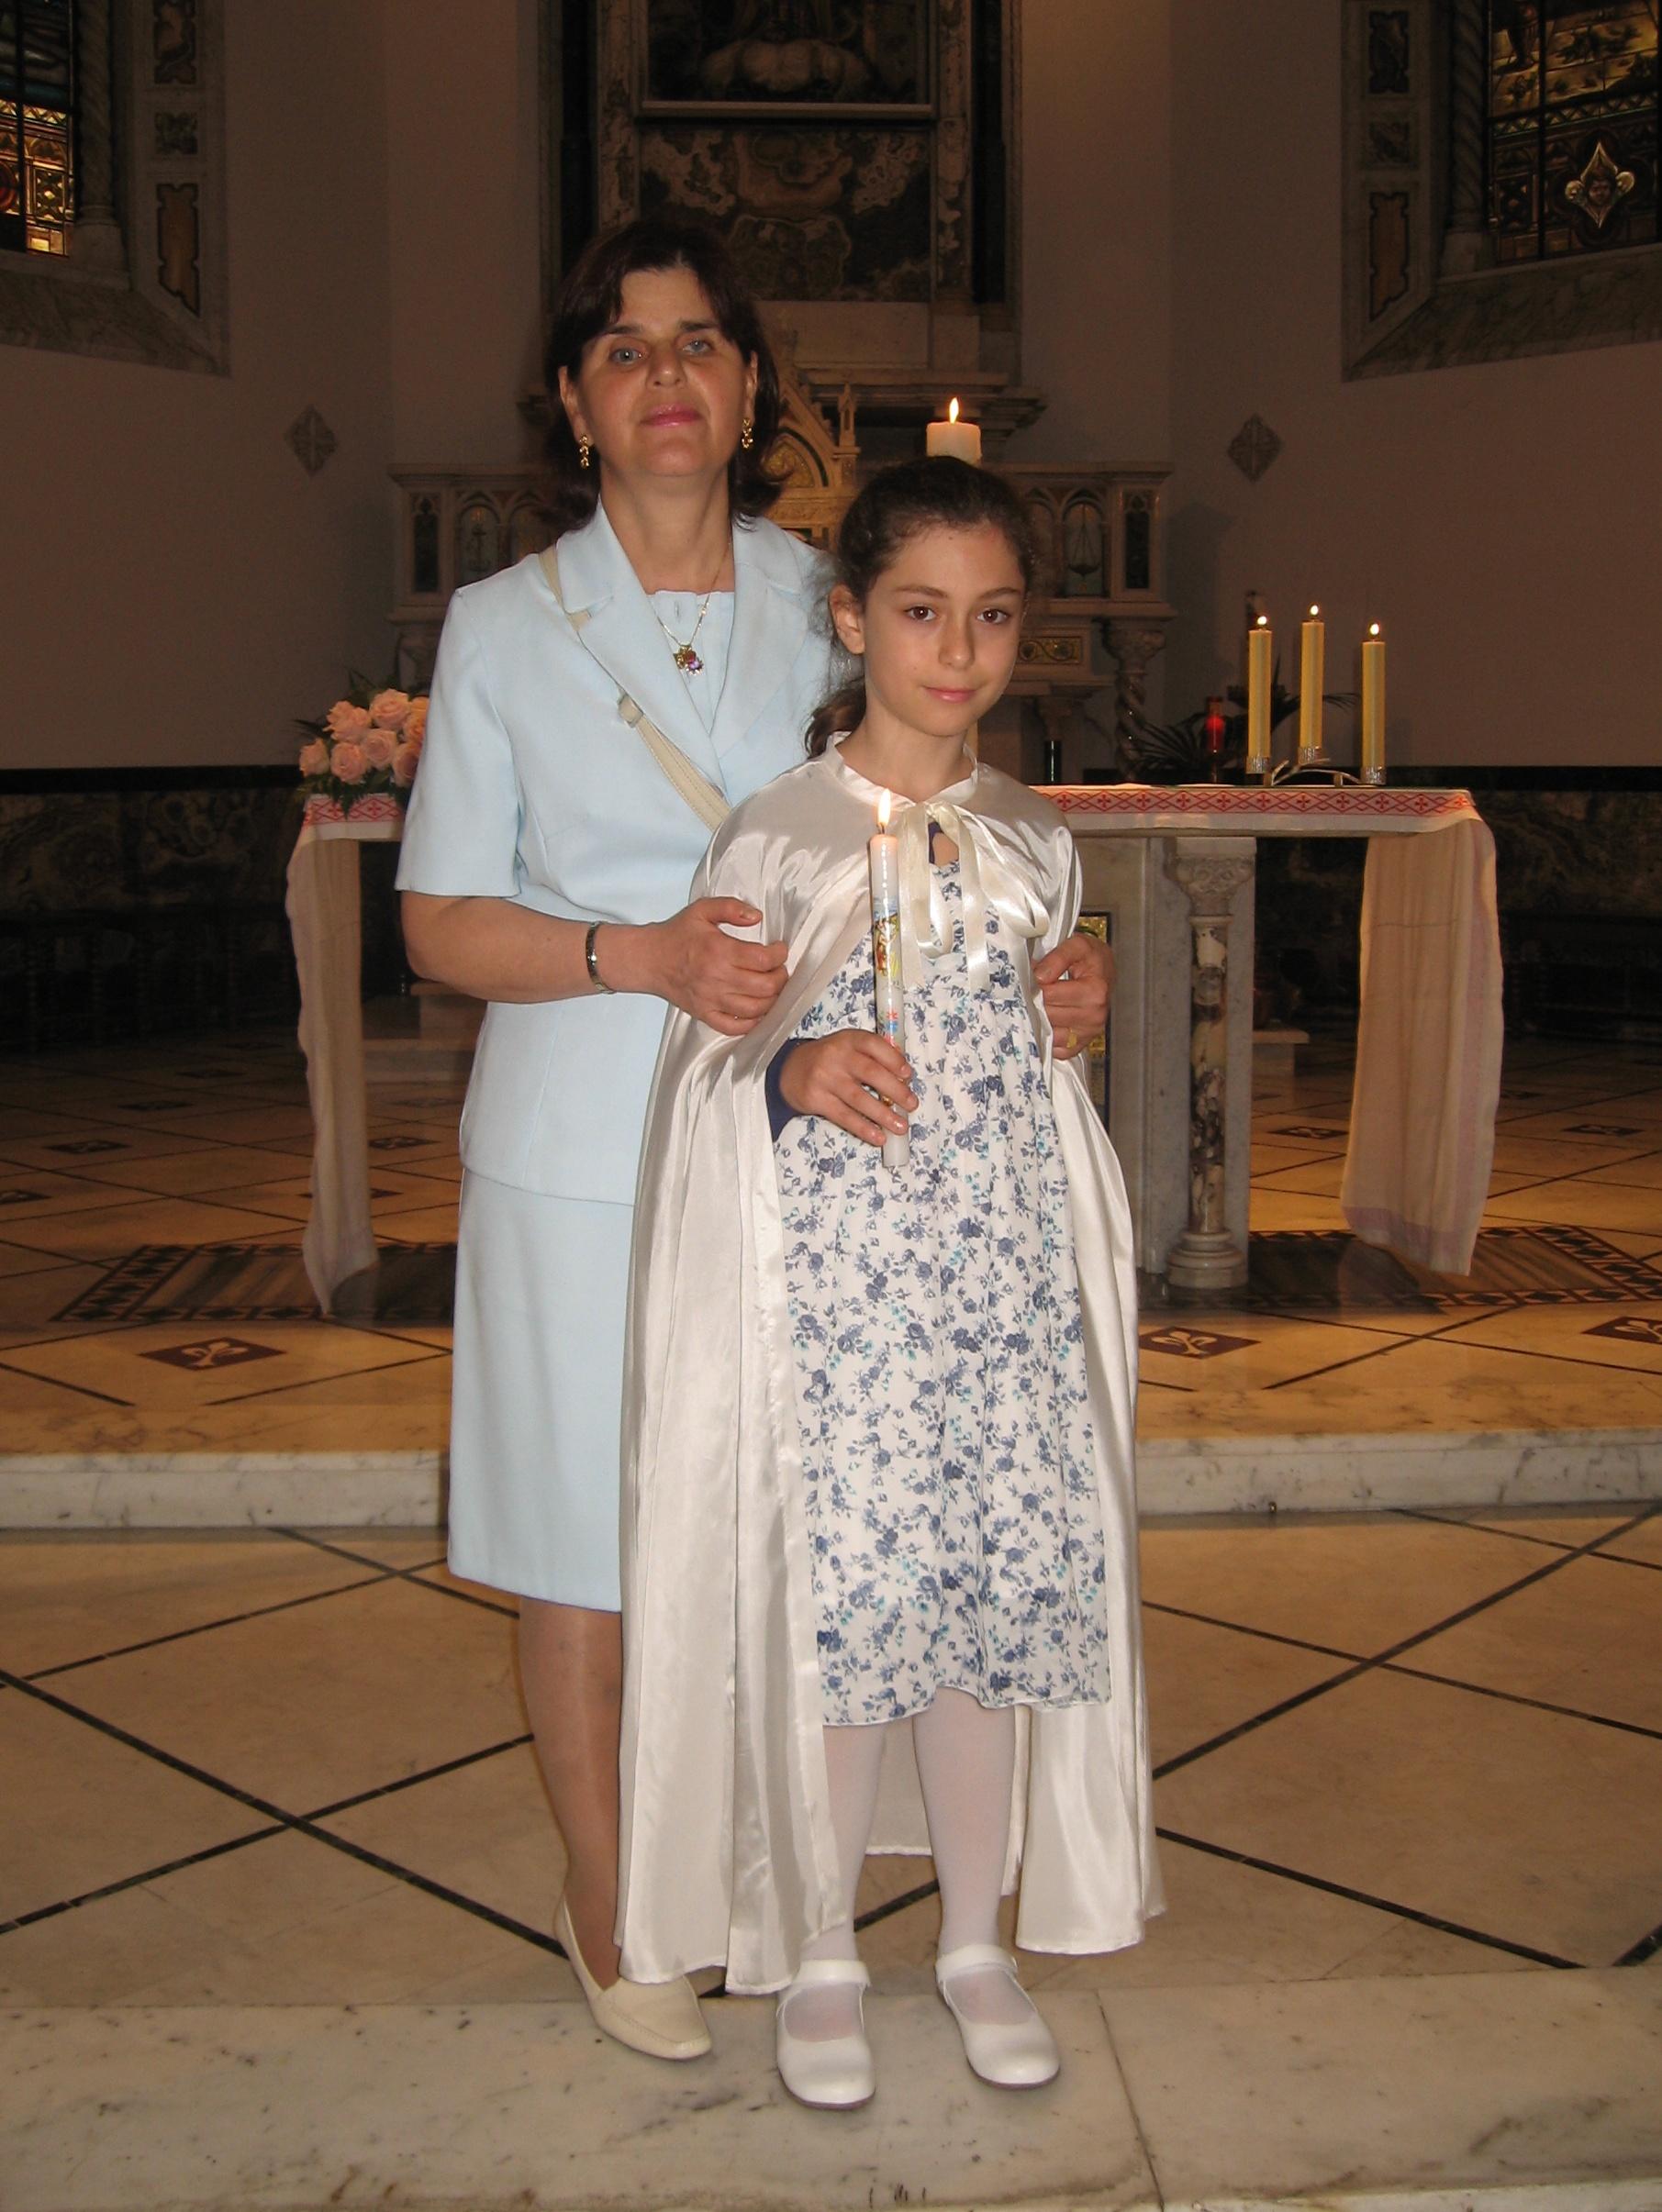 Battesimo_Jasmine_Romagnolo_10-05-22--11.30.52